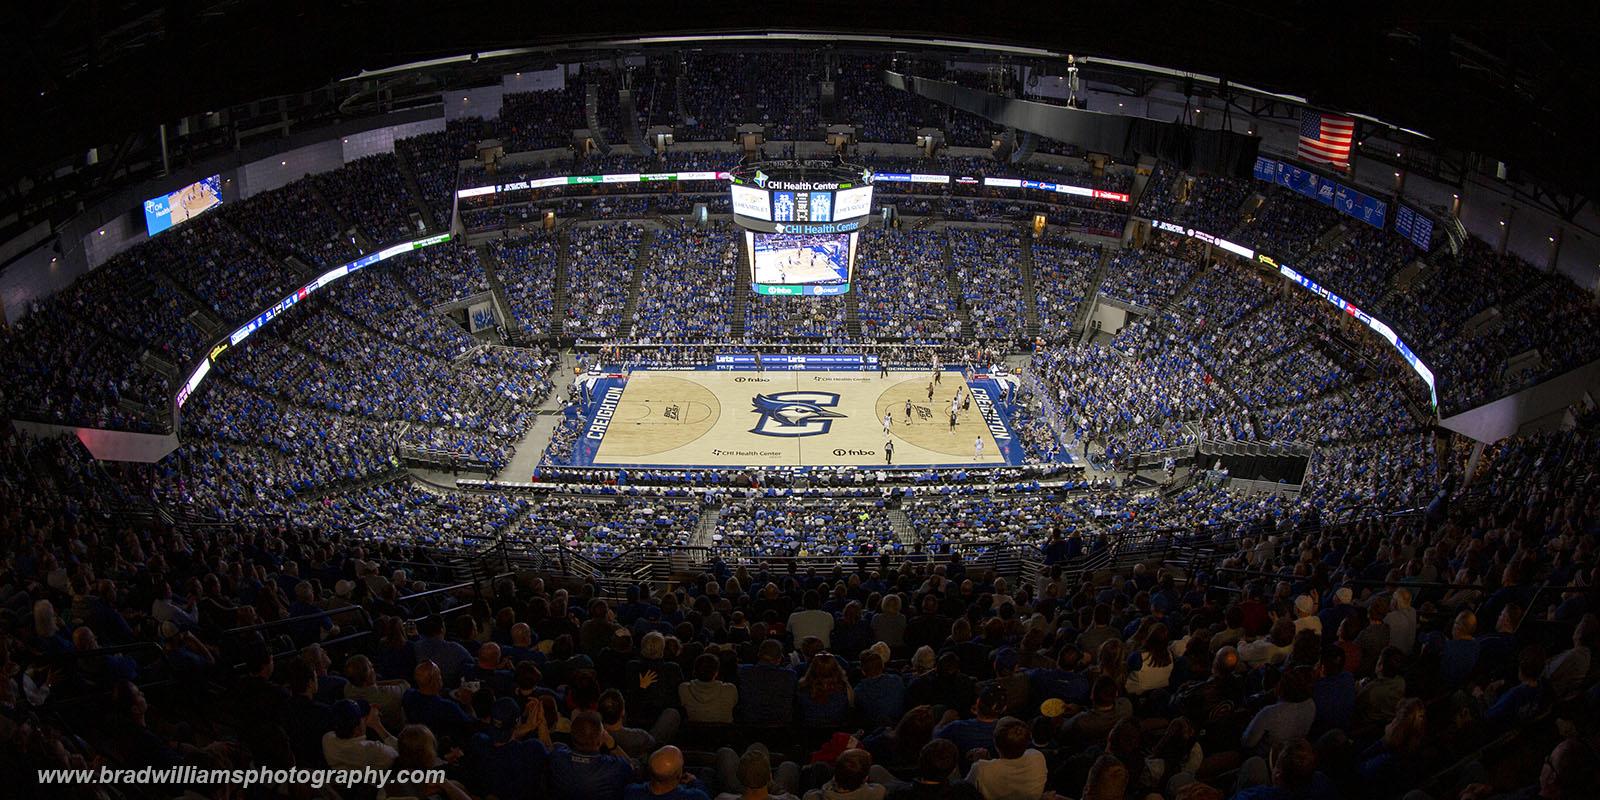 Creighton VS Butler 2/23/2020, Attendance = 18,148